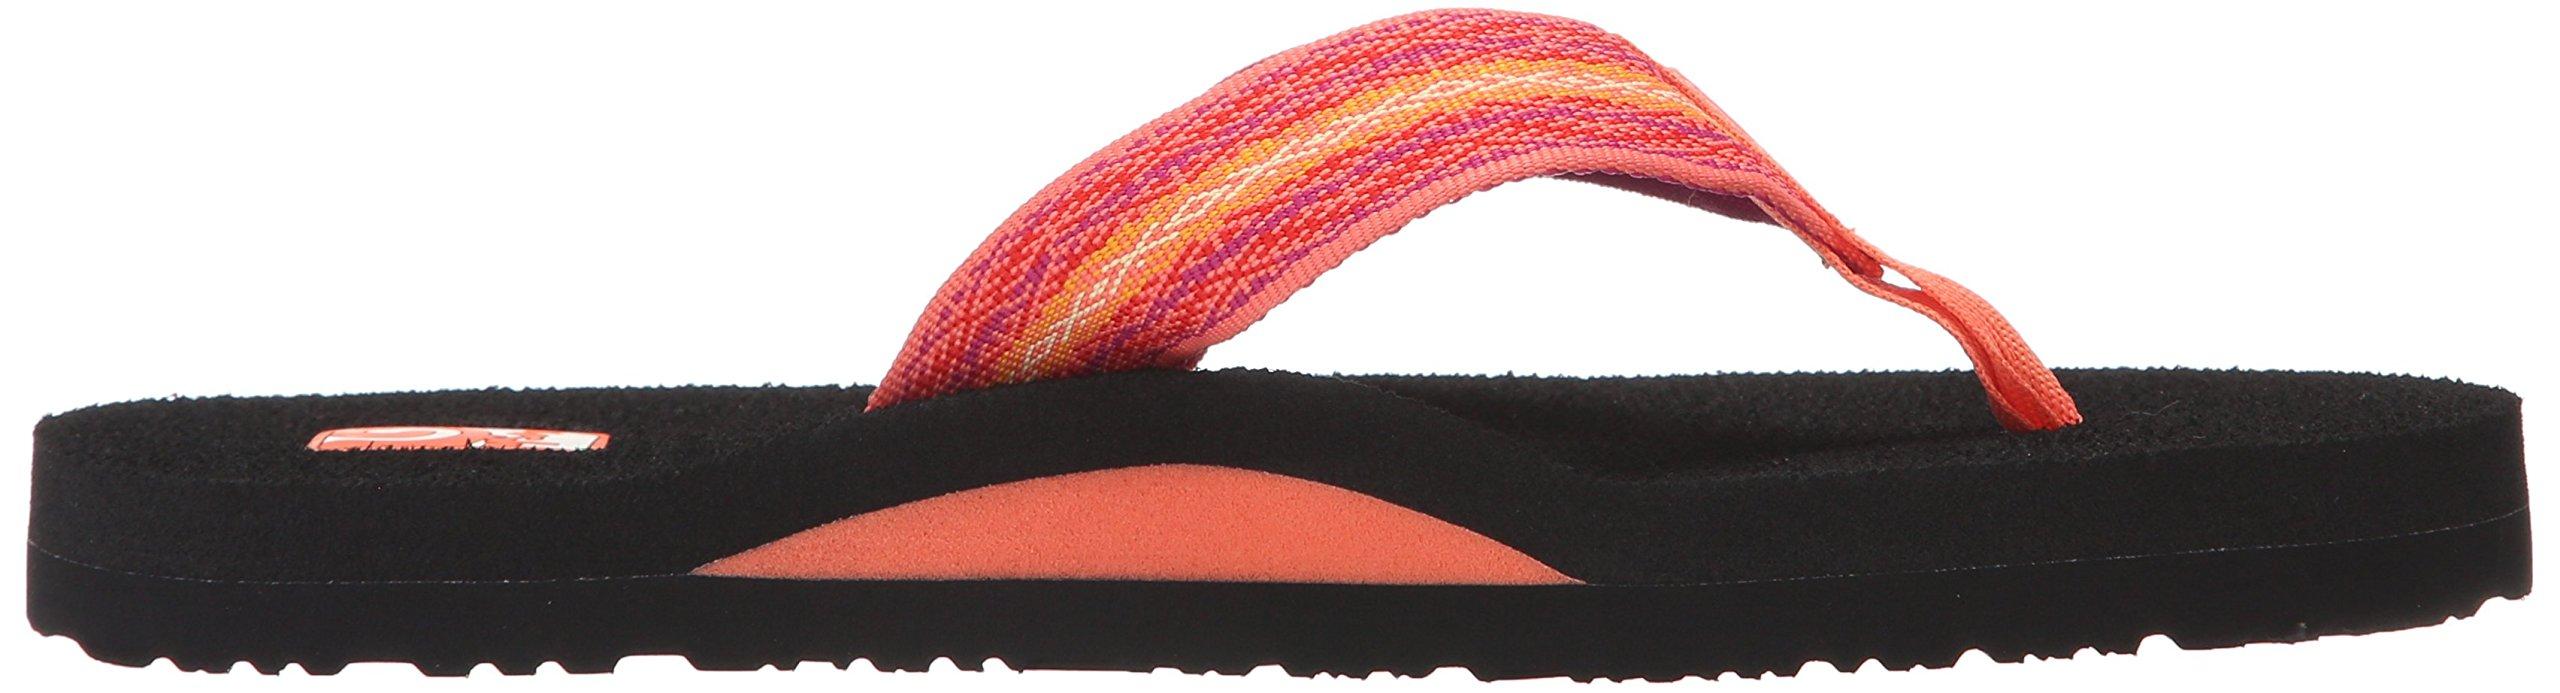 ca439af7f Teva Women s Mush II Flip-Flop Two-Pack - 4198C-FBLMR   Flip-Flops    Clothing